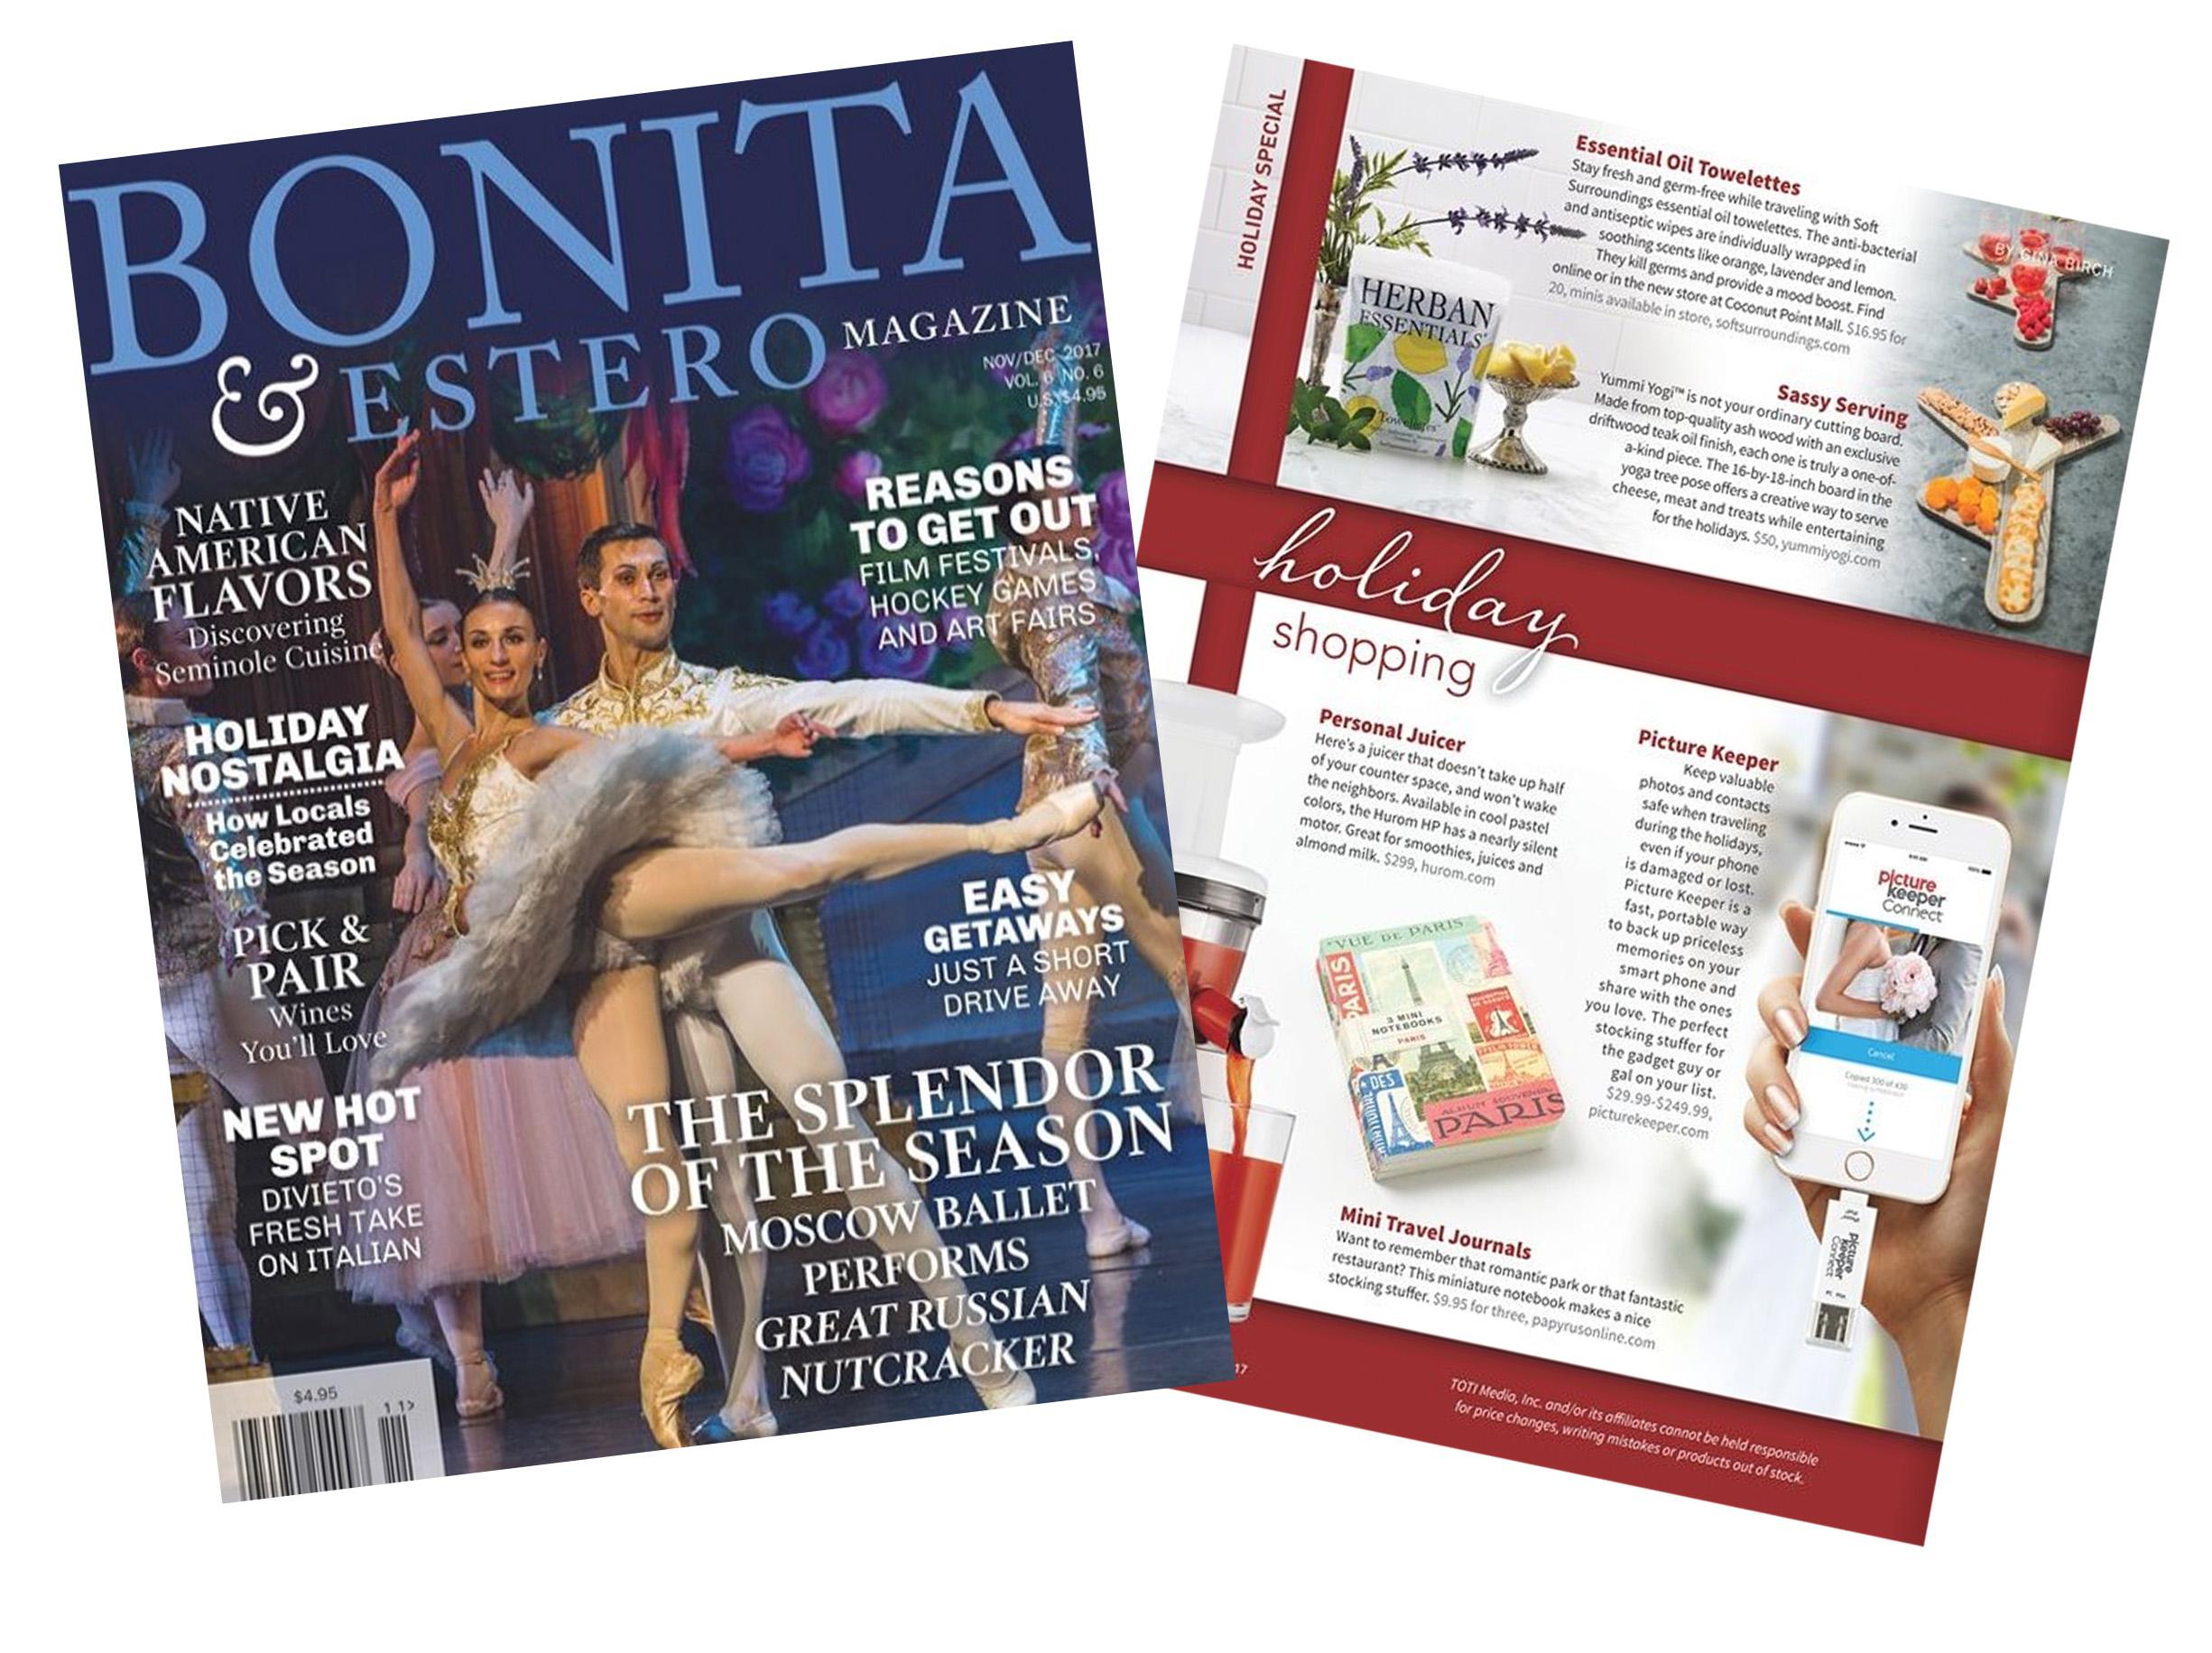 Bonita and estero 2 page